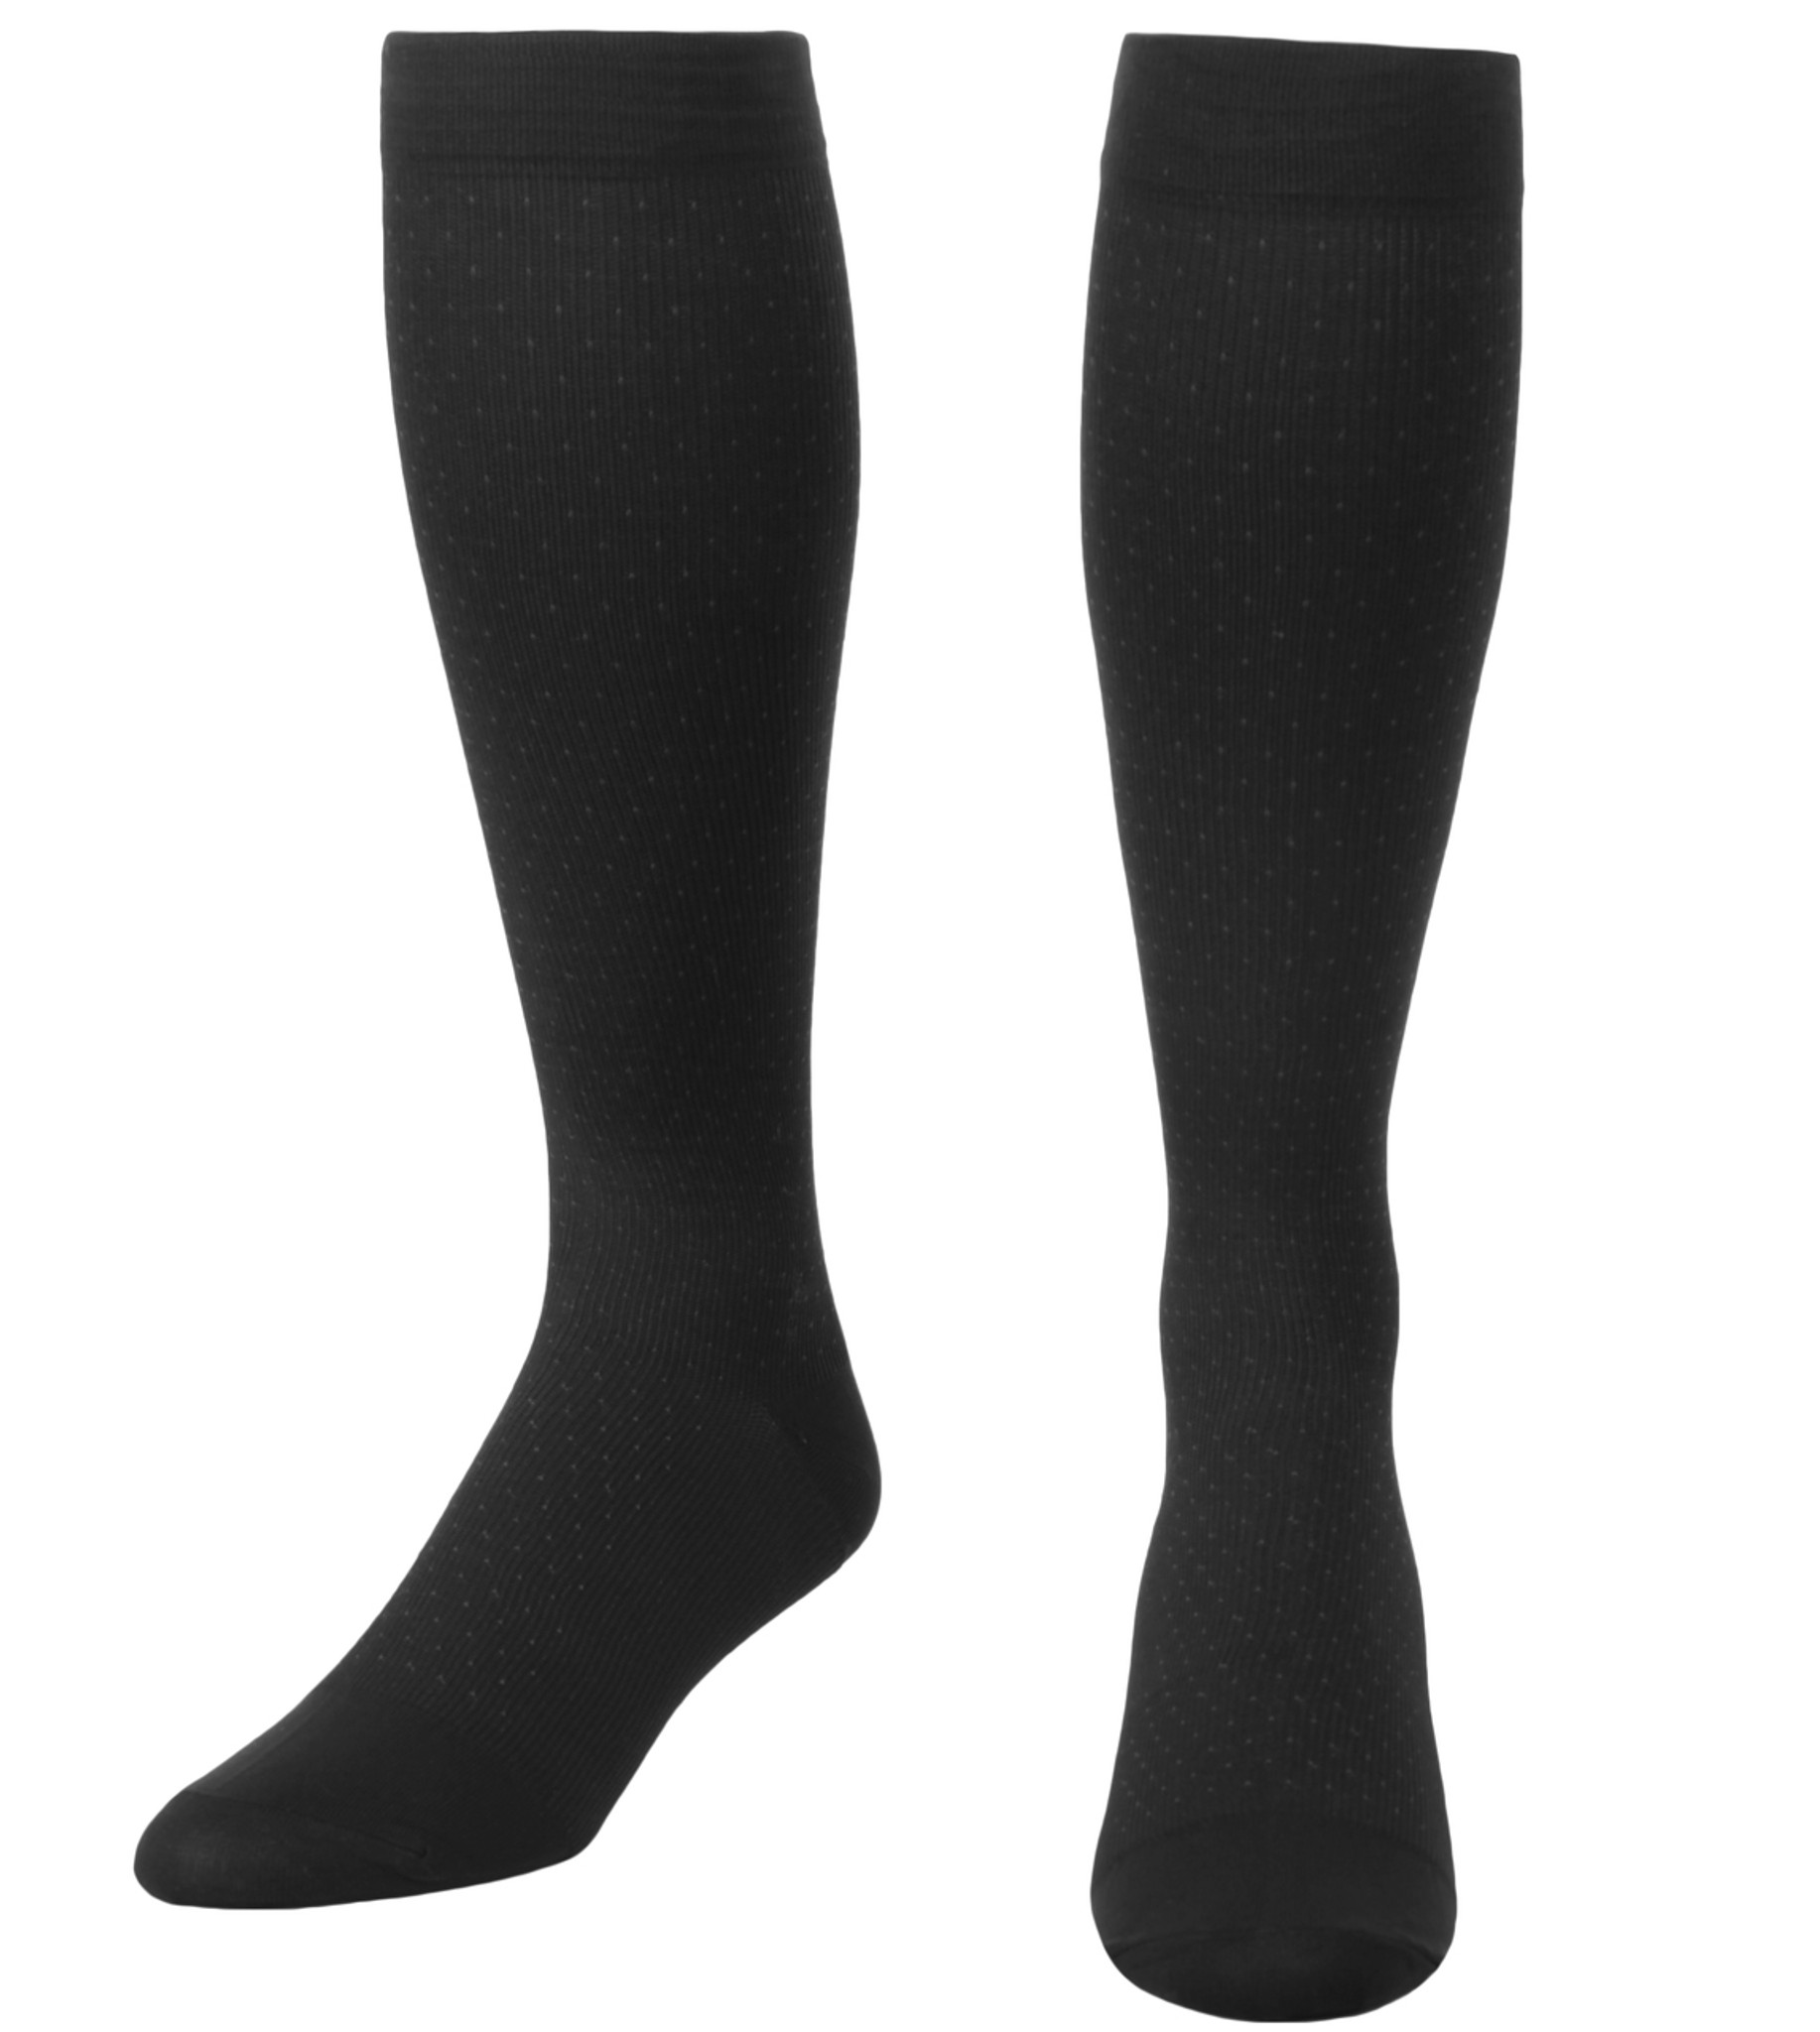 48dc54370b1 ... Medium Support (15-20mmHg) Black Knee High Compression Socks